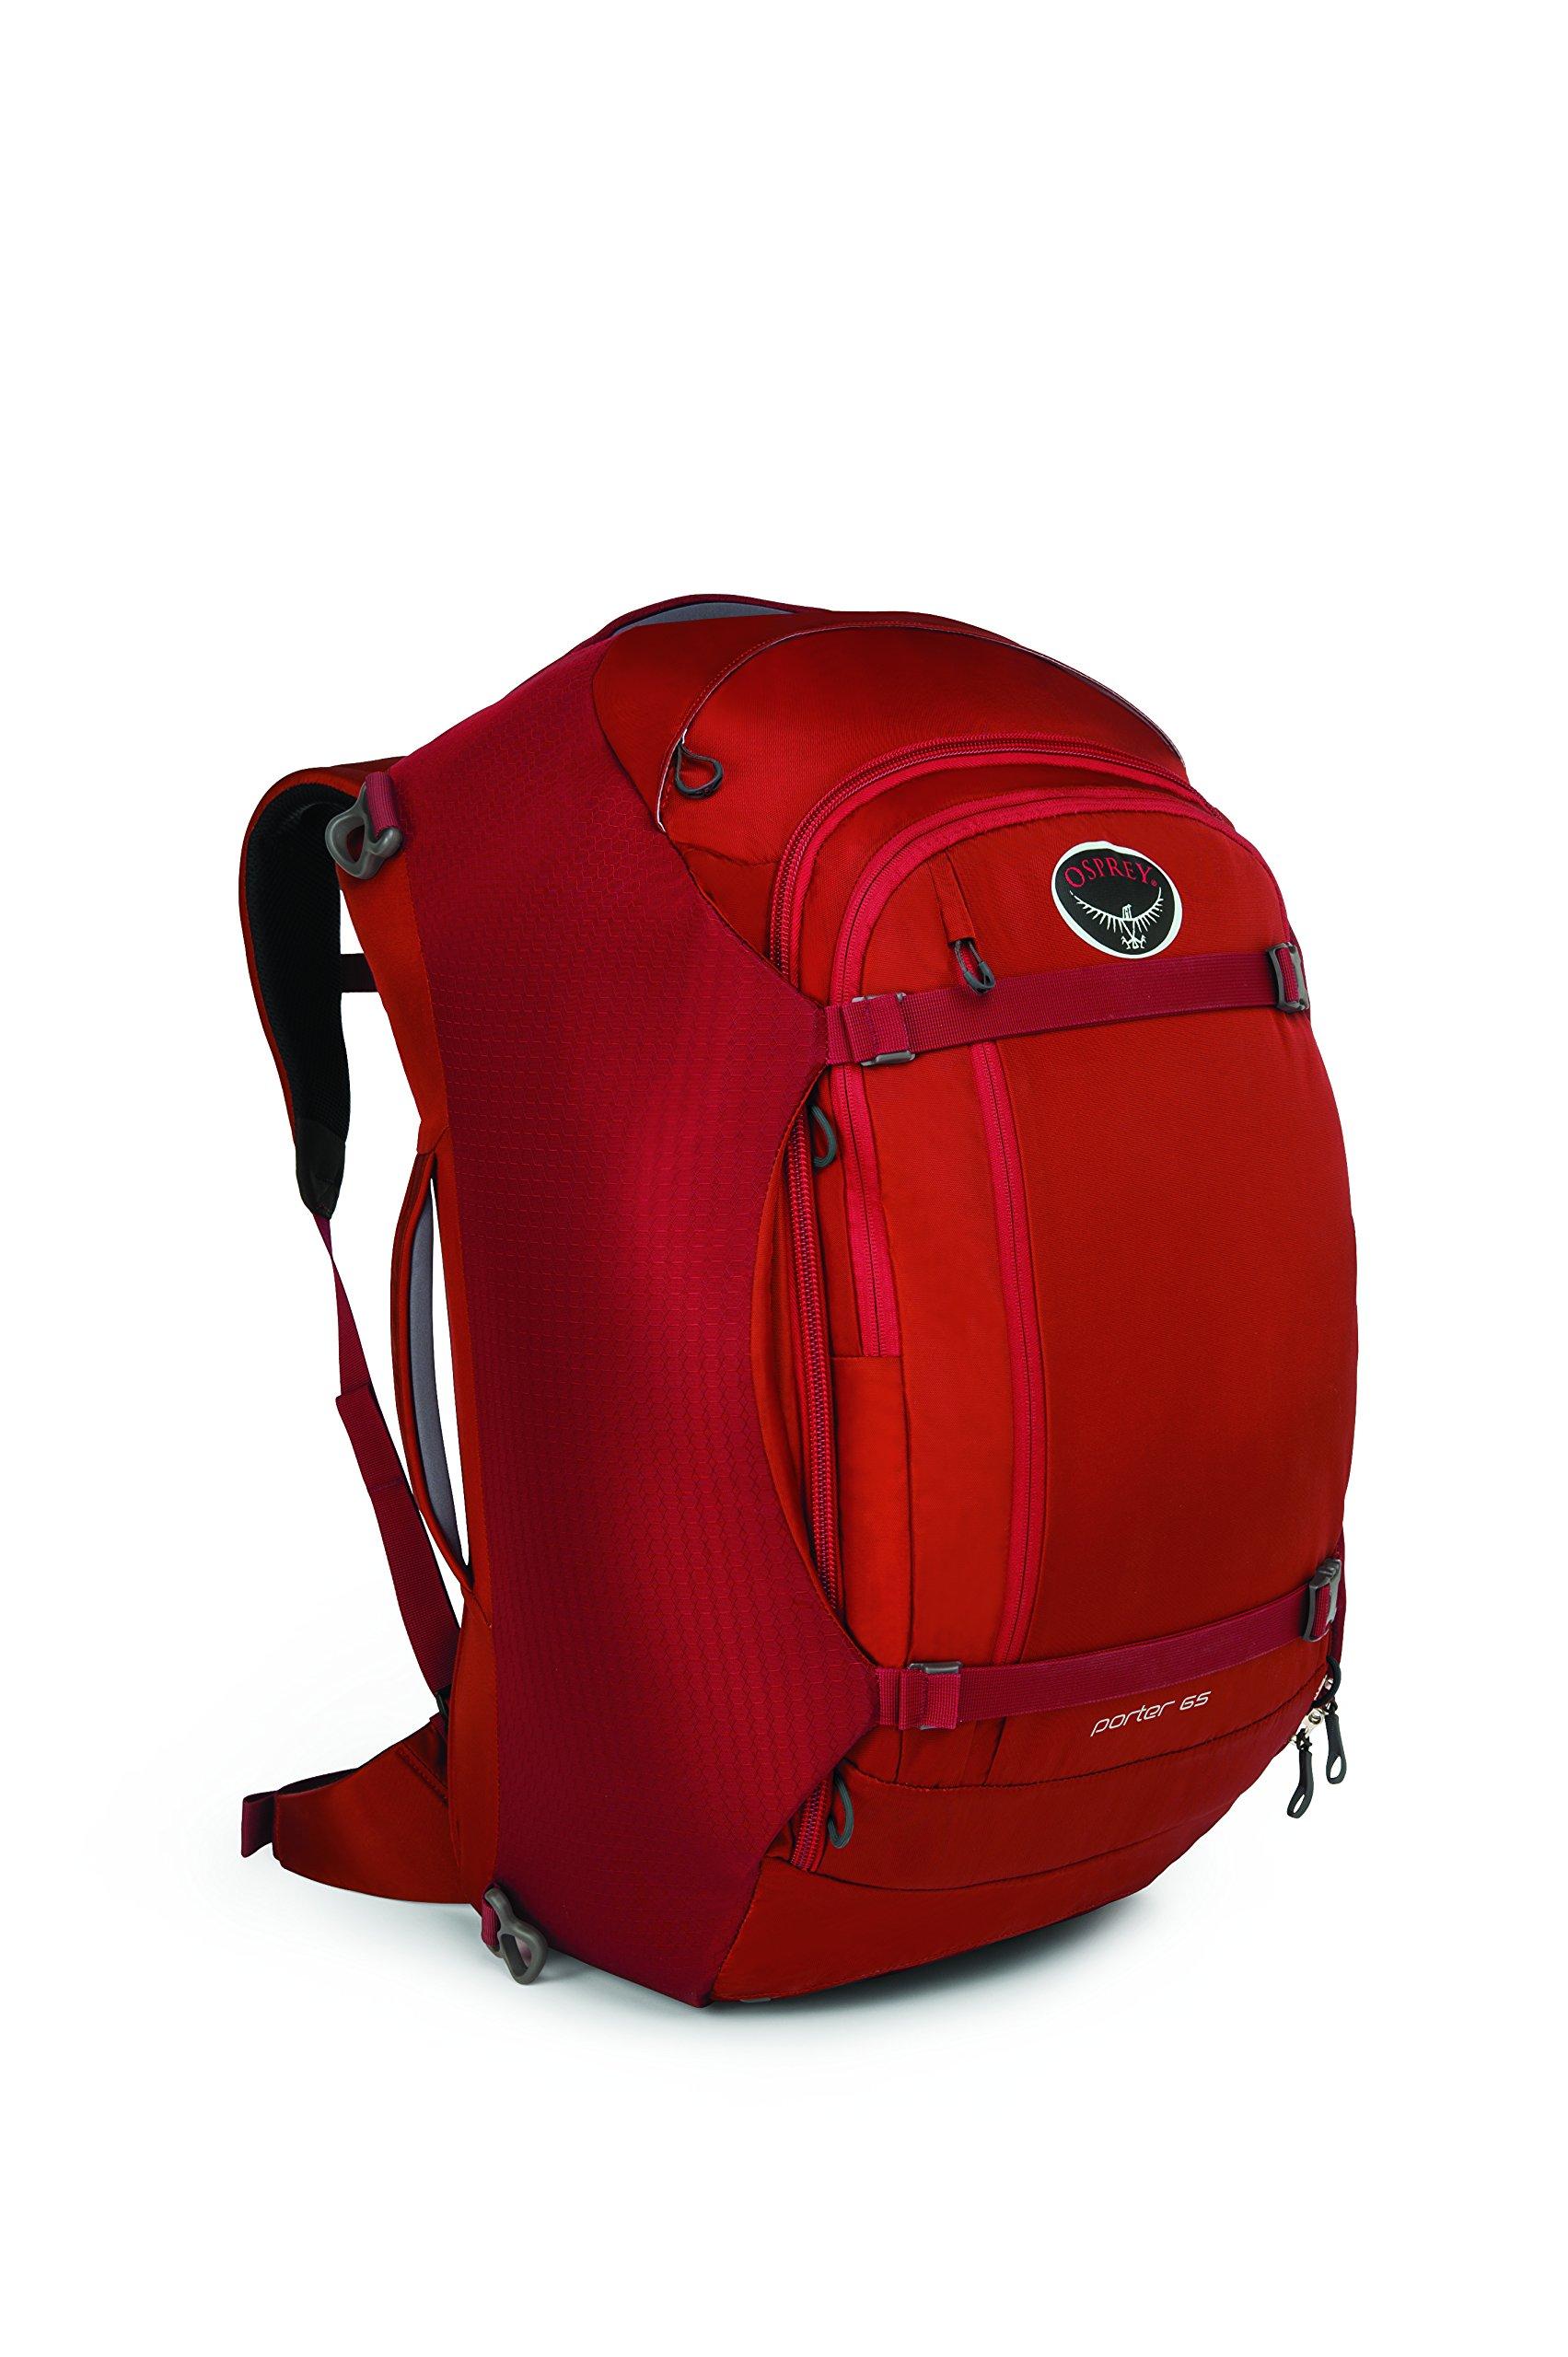 Osprey Porter Travel Duffel Bag, Hoodoo Red, 65-Liter by Osprey